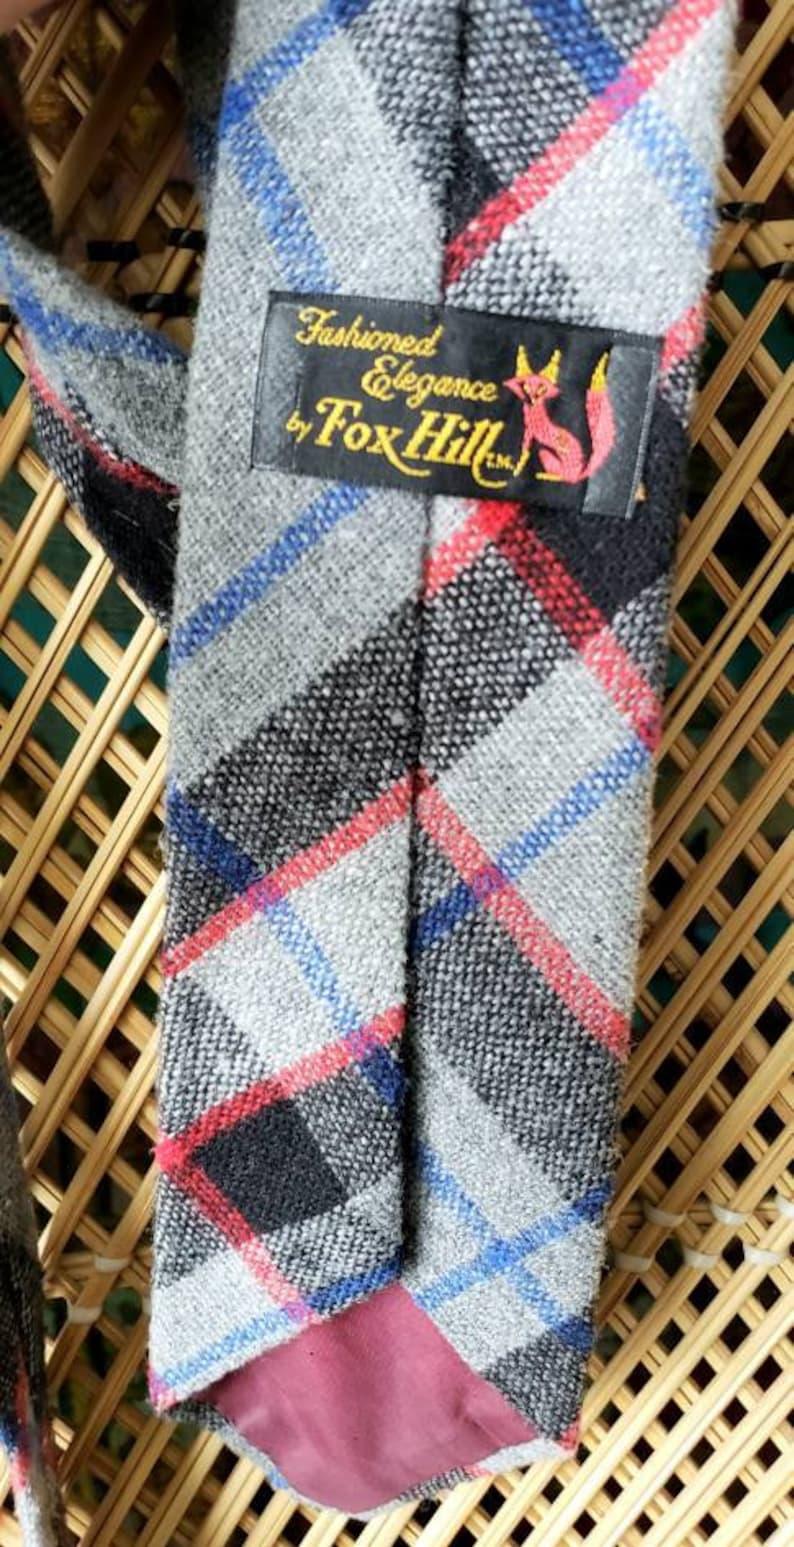 Vintage Fox Hill Tie Vintage Plaid Tie Wool Necktie 60s Wool Plaid Necktie By Fox Hill